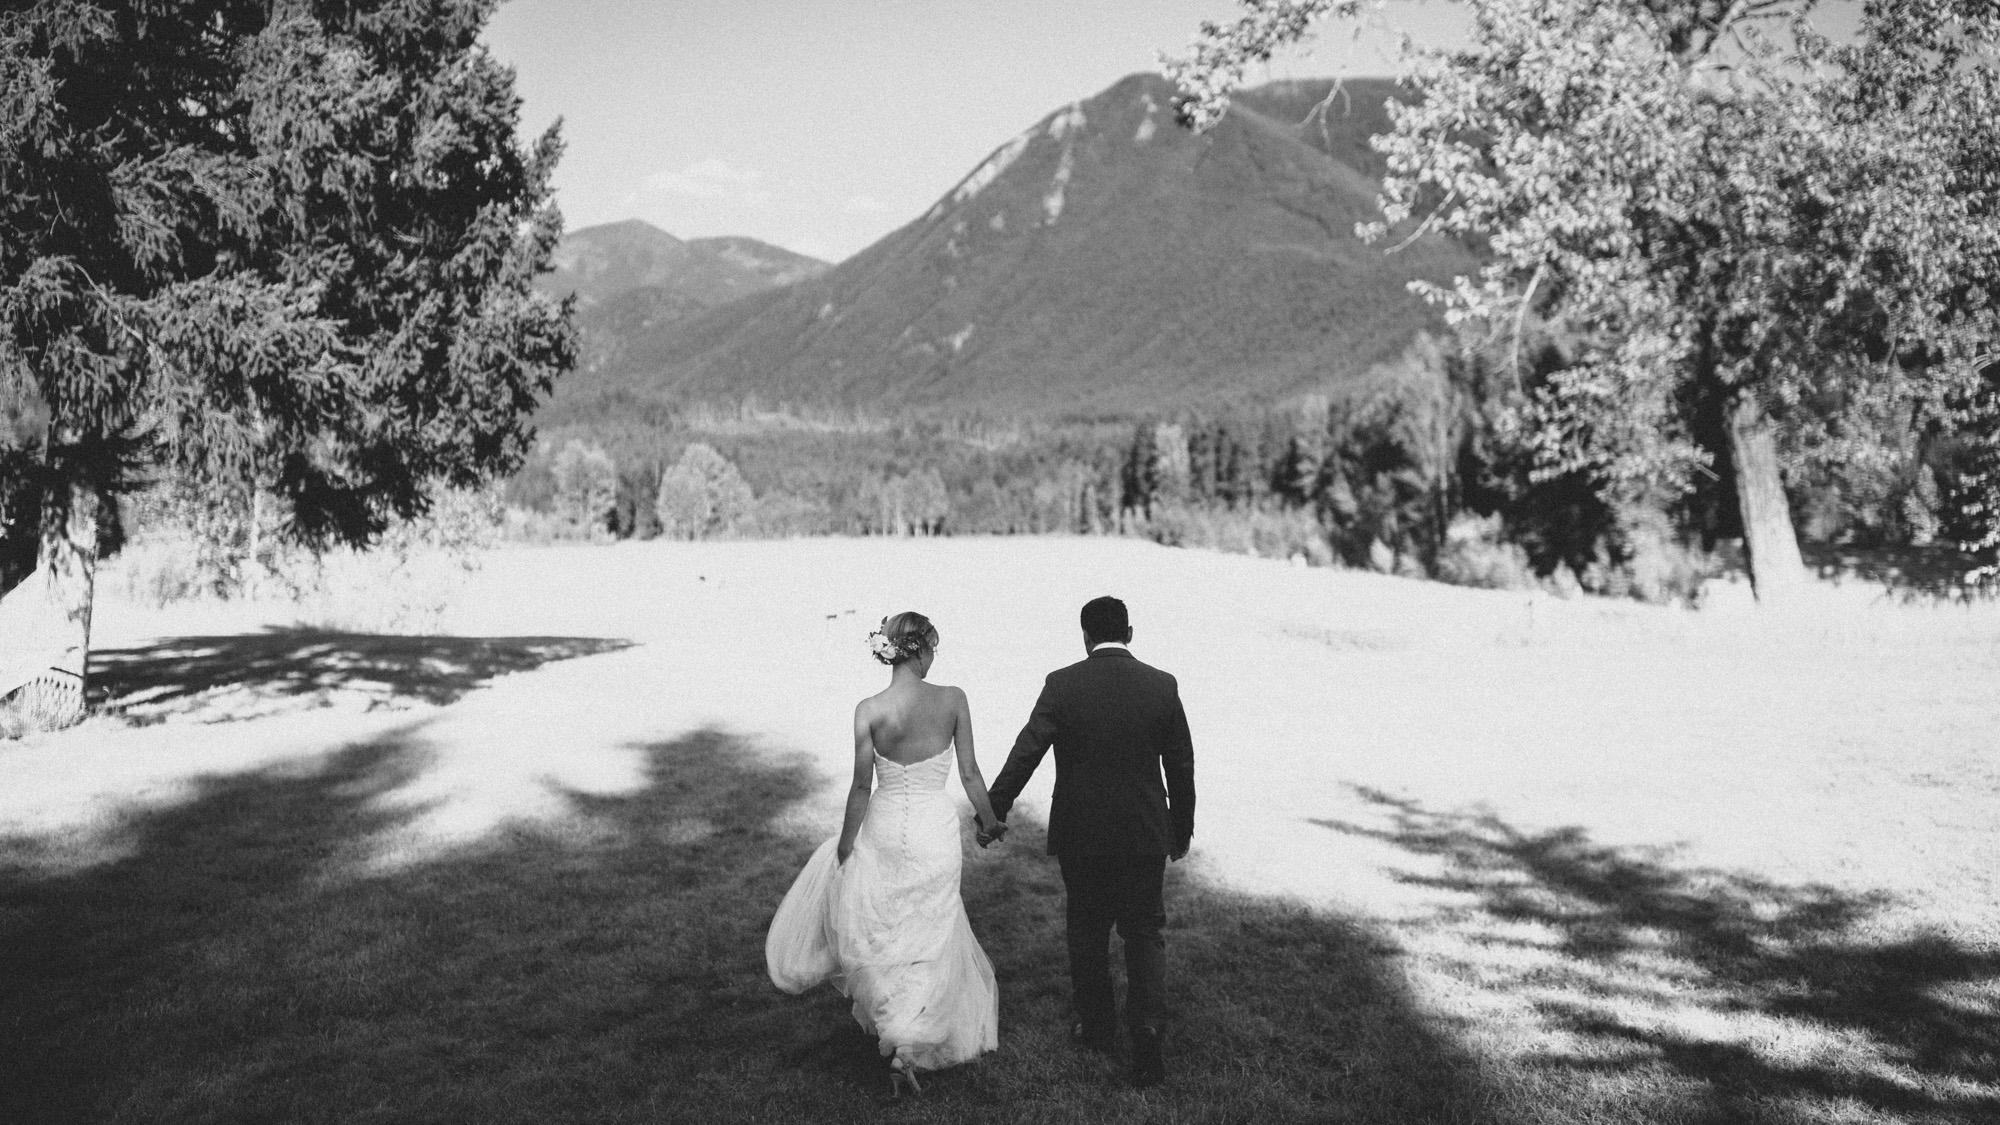 Montana_Wedding_Photos_alec_vanderboom-0117.jpg